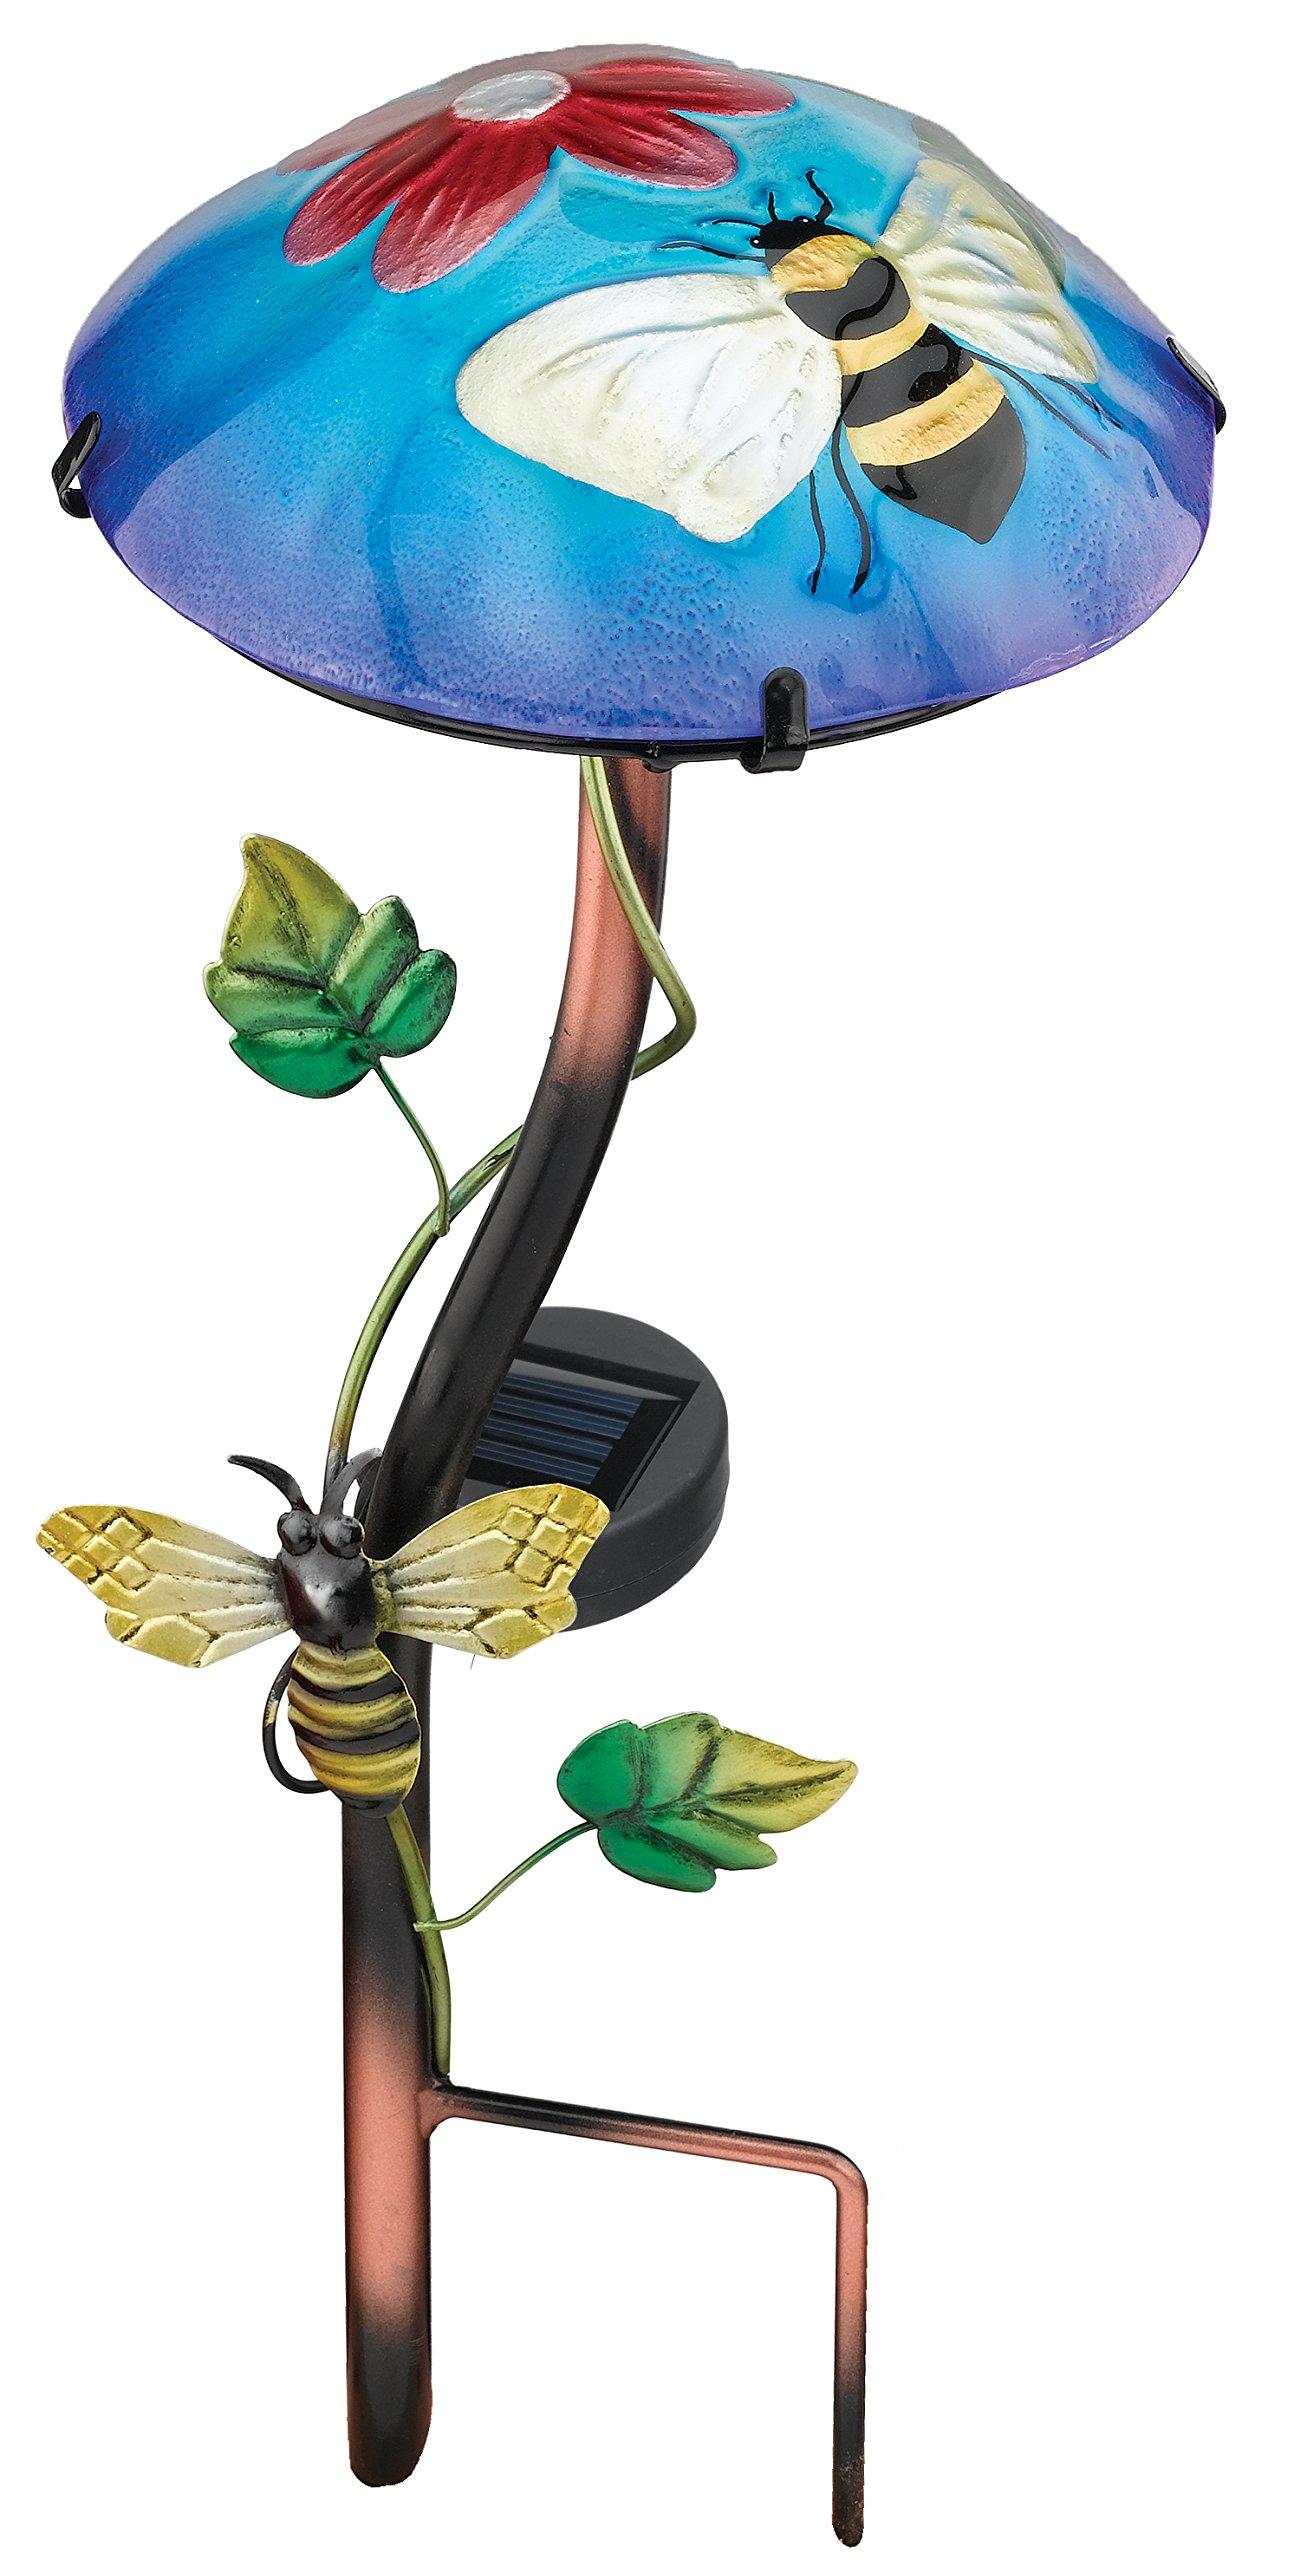 Regal Art &Gift Solar Mushroom Stake, Bee